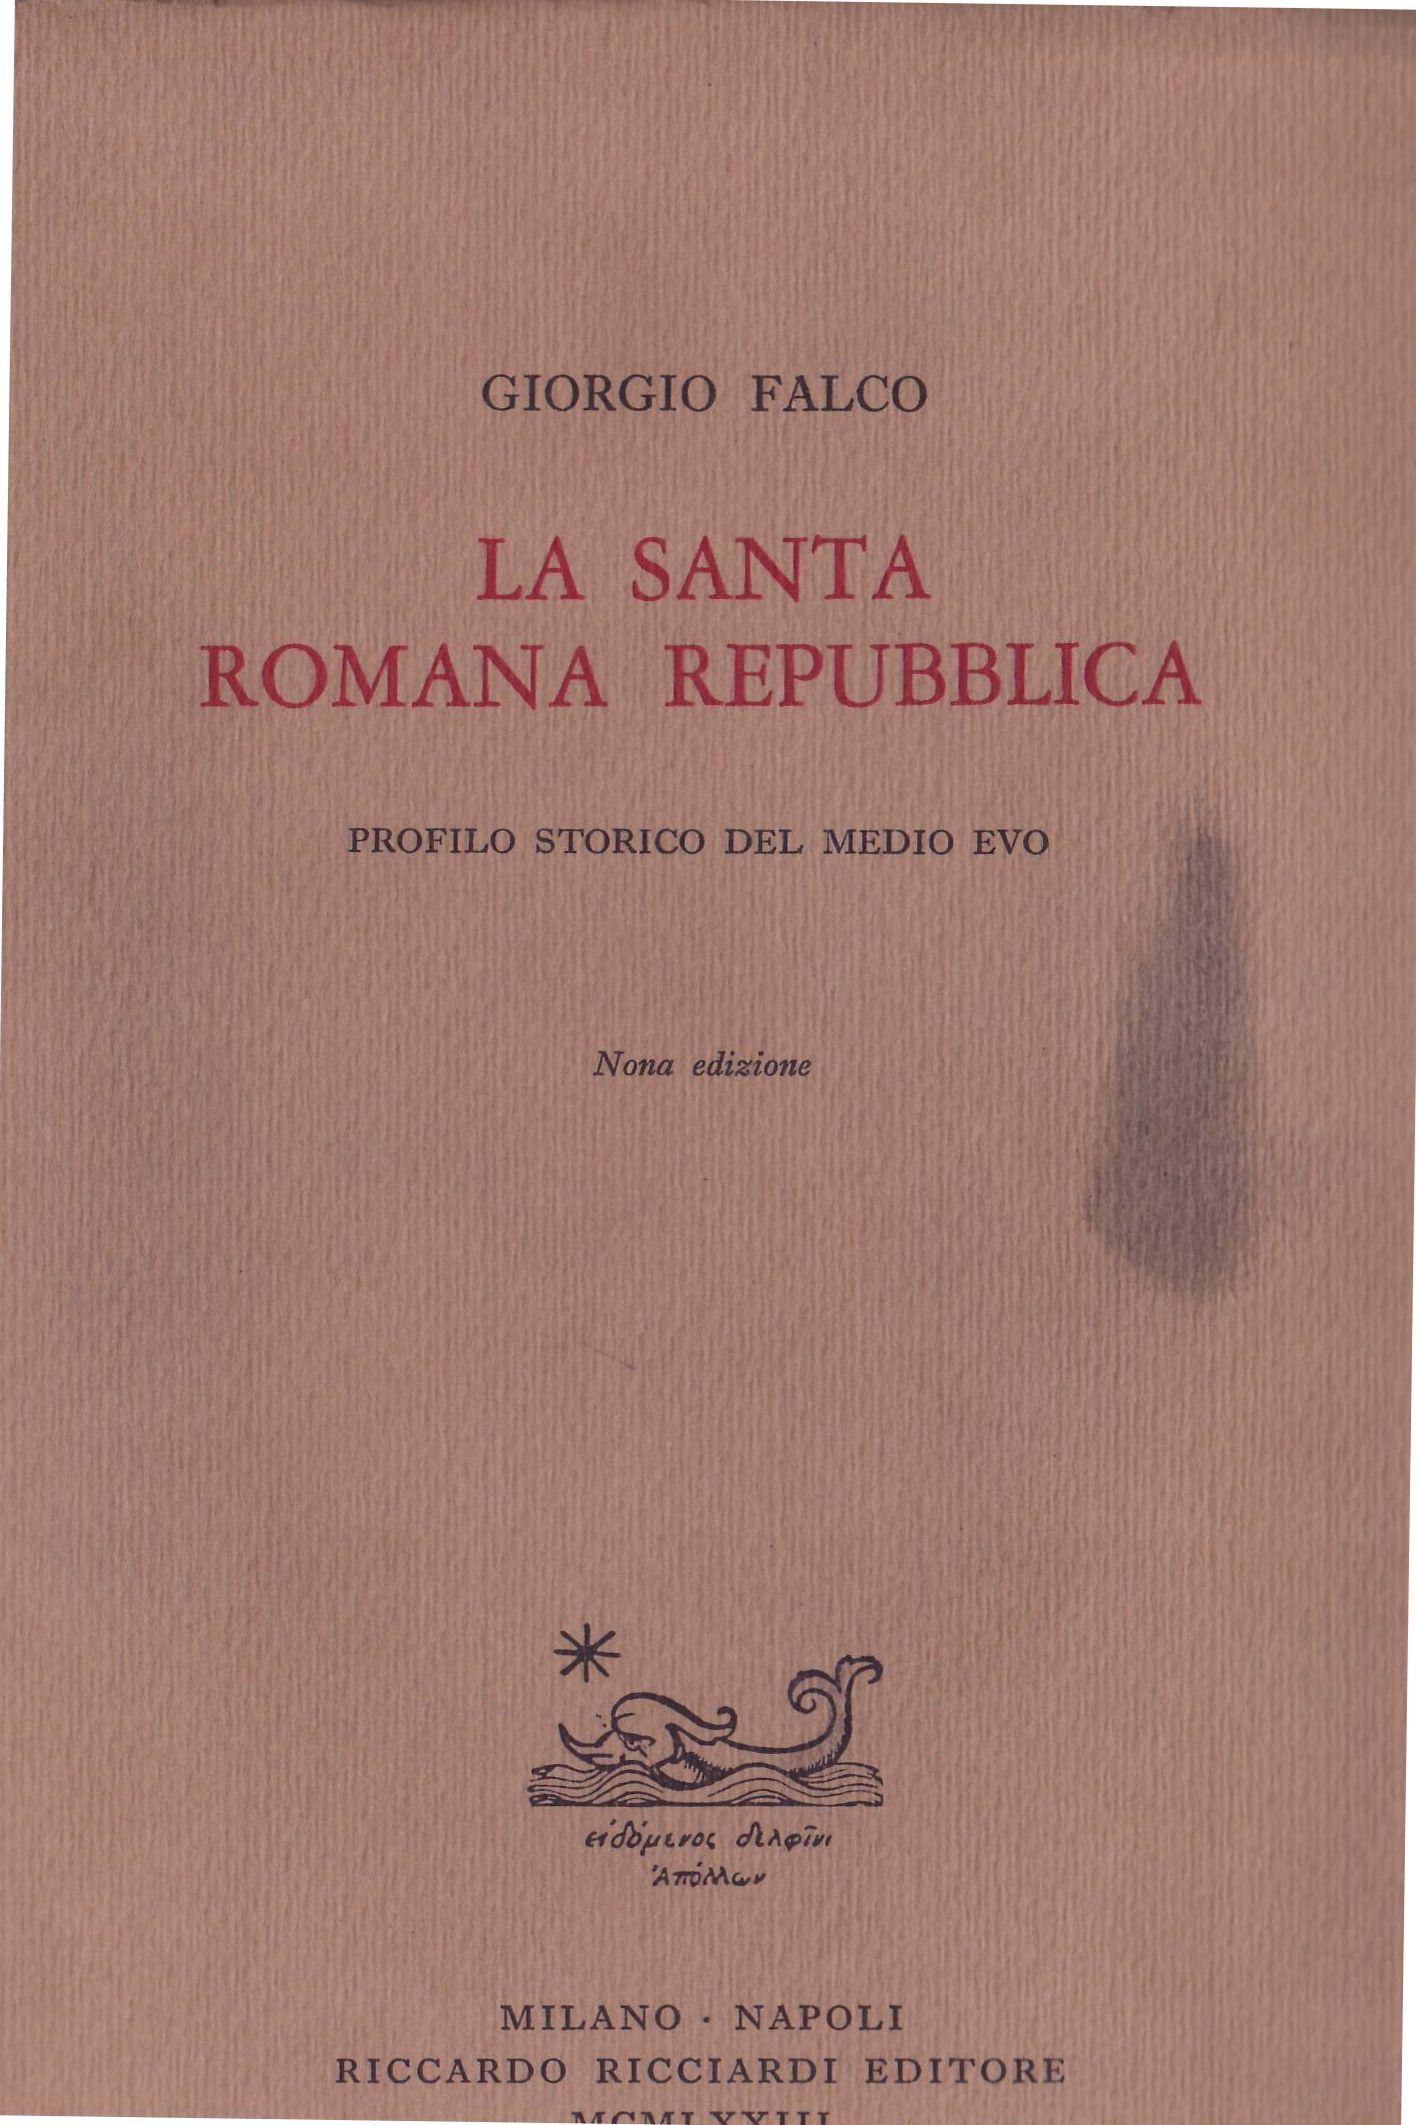 La santa romana repu...